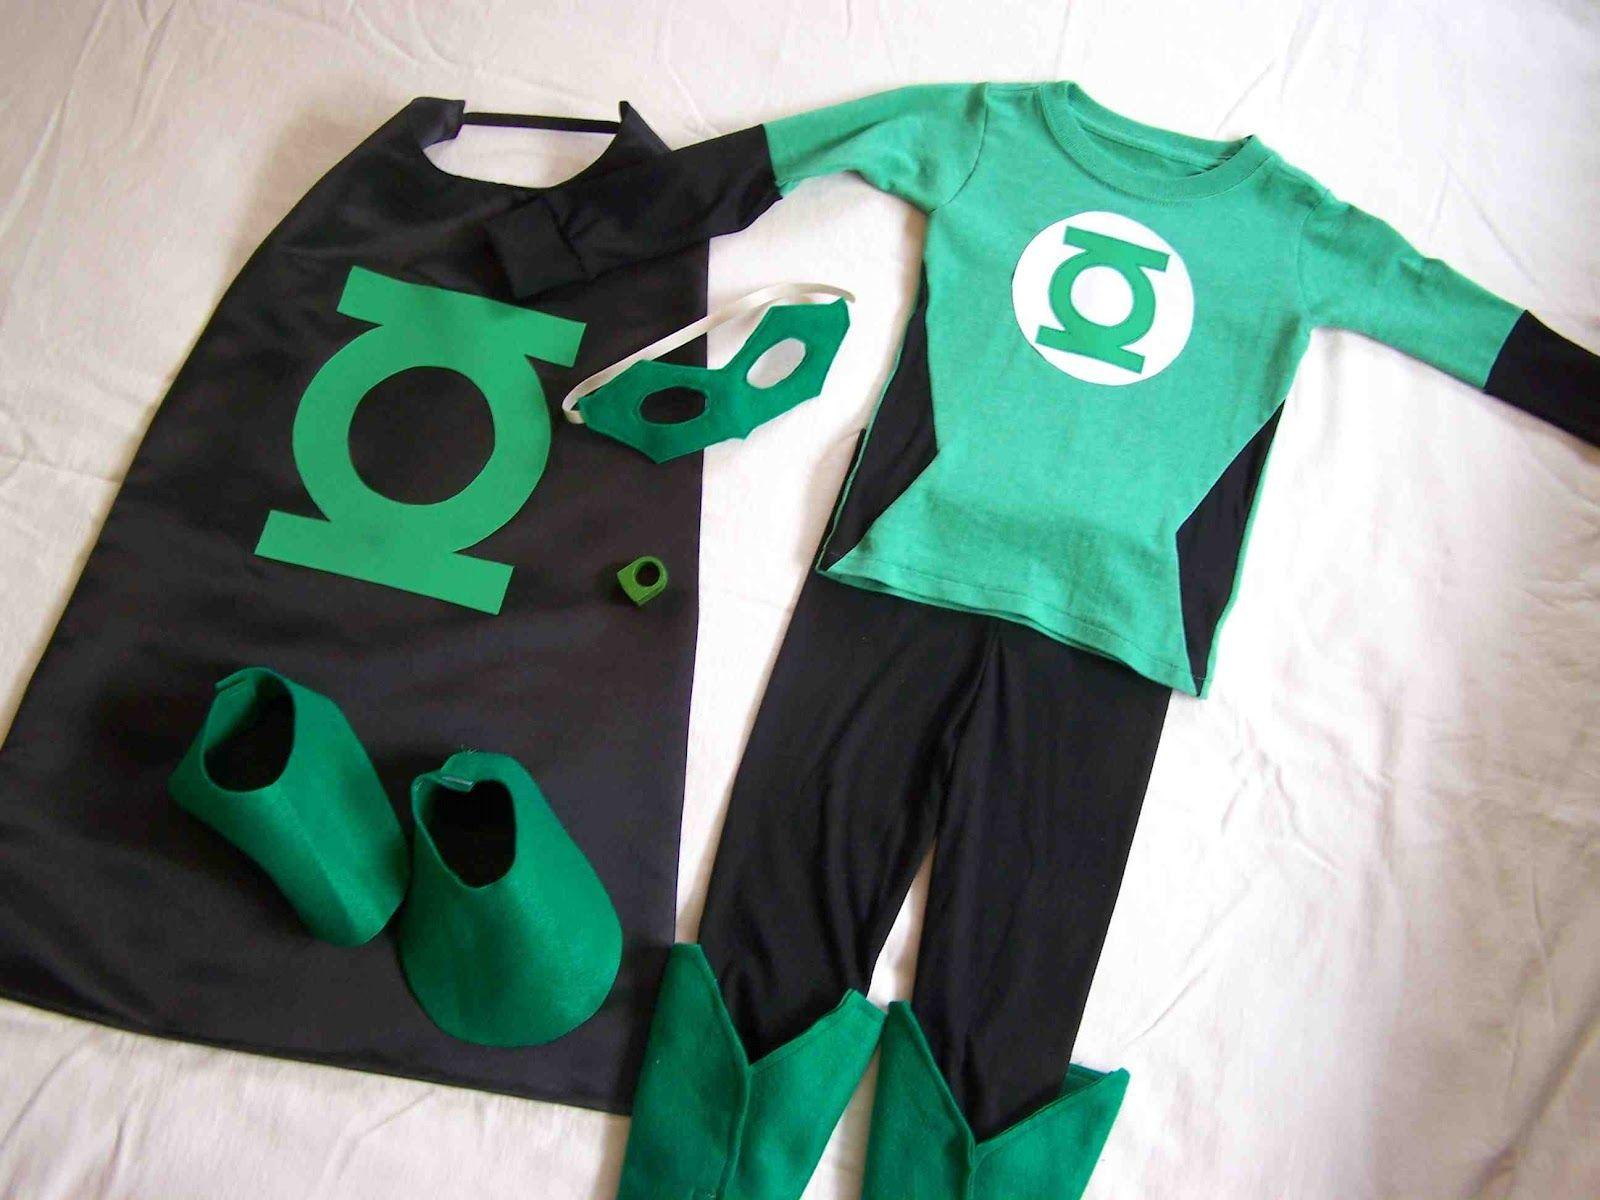 best 25 green lantern costume ideas on pinterest green. Black Bedroom Furniture Sets. Home Design Ideas